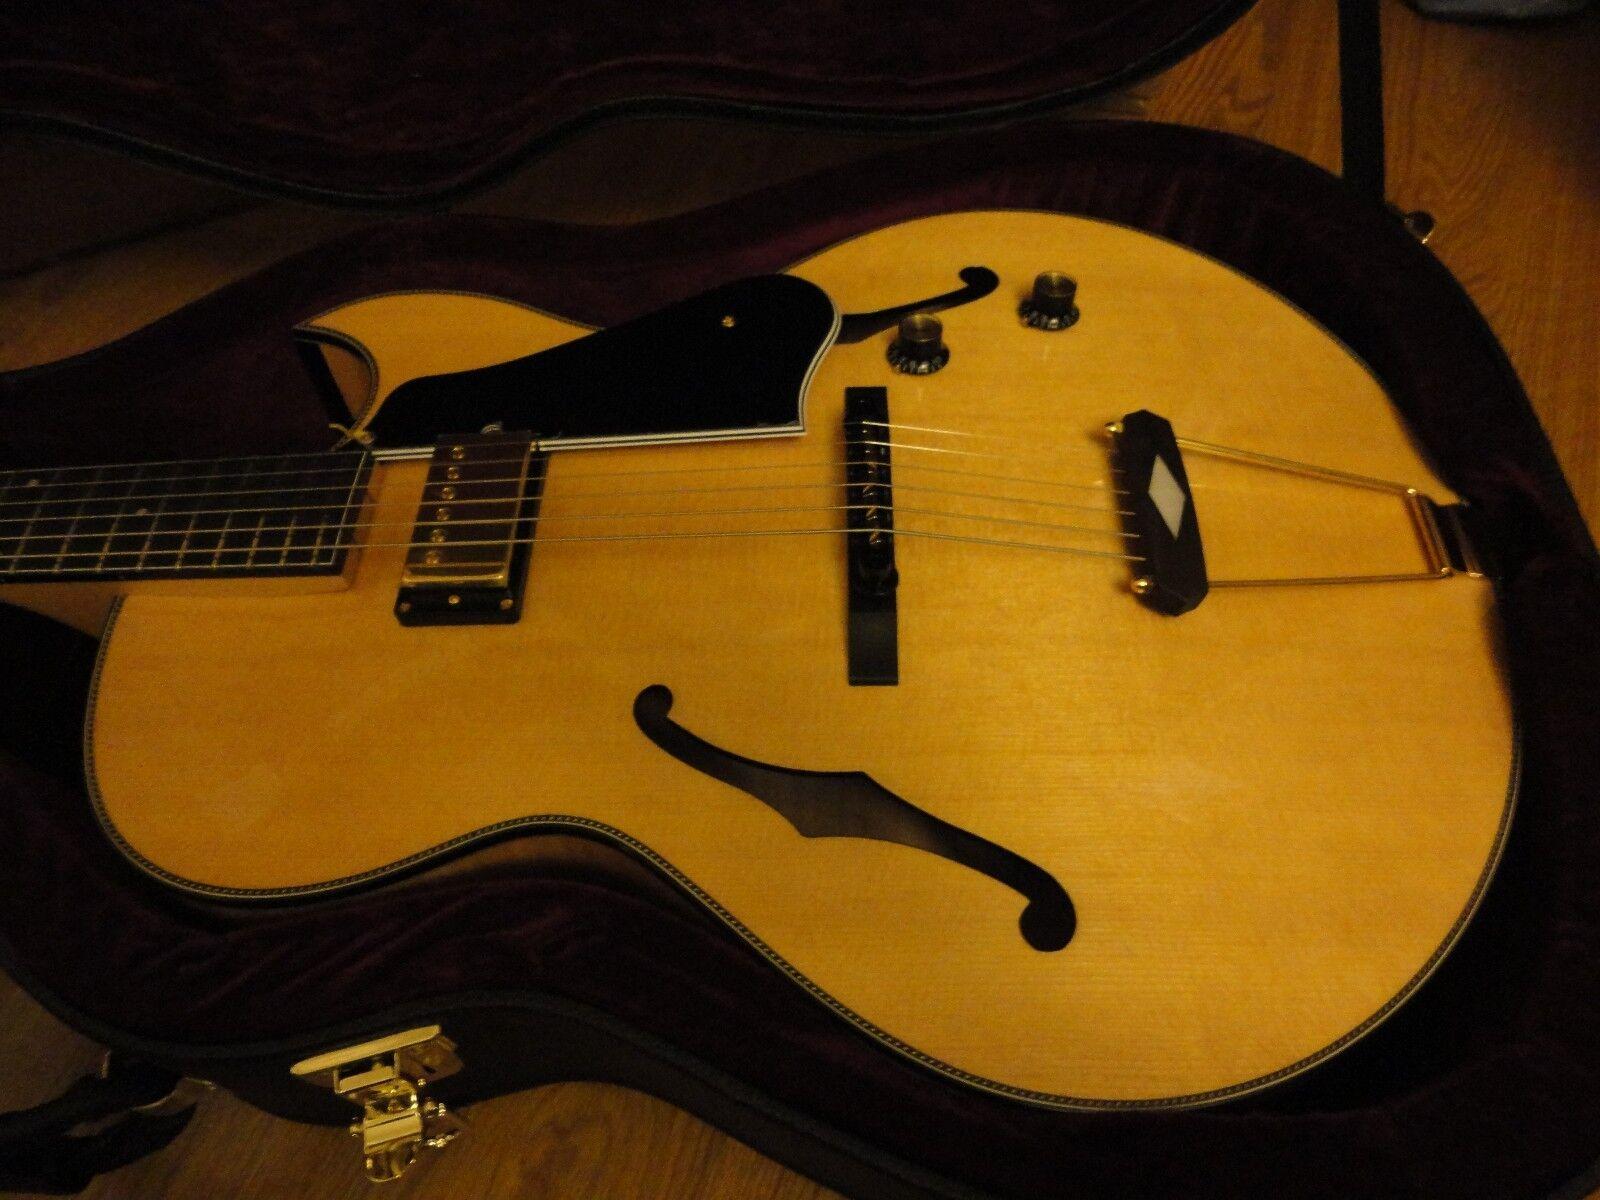 Archtop Seventy Seven Fat Hawk Jazz handmade in Japan NA